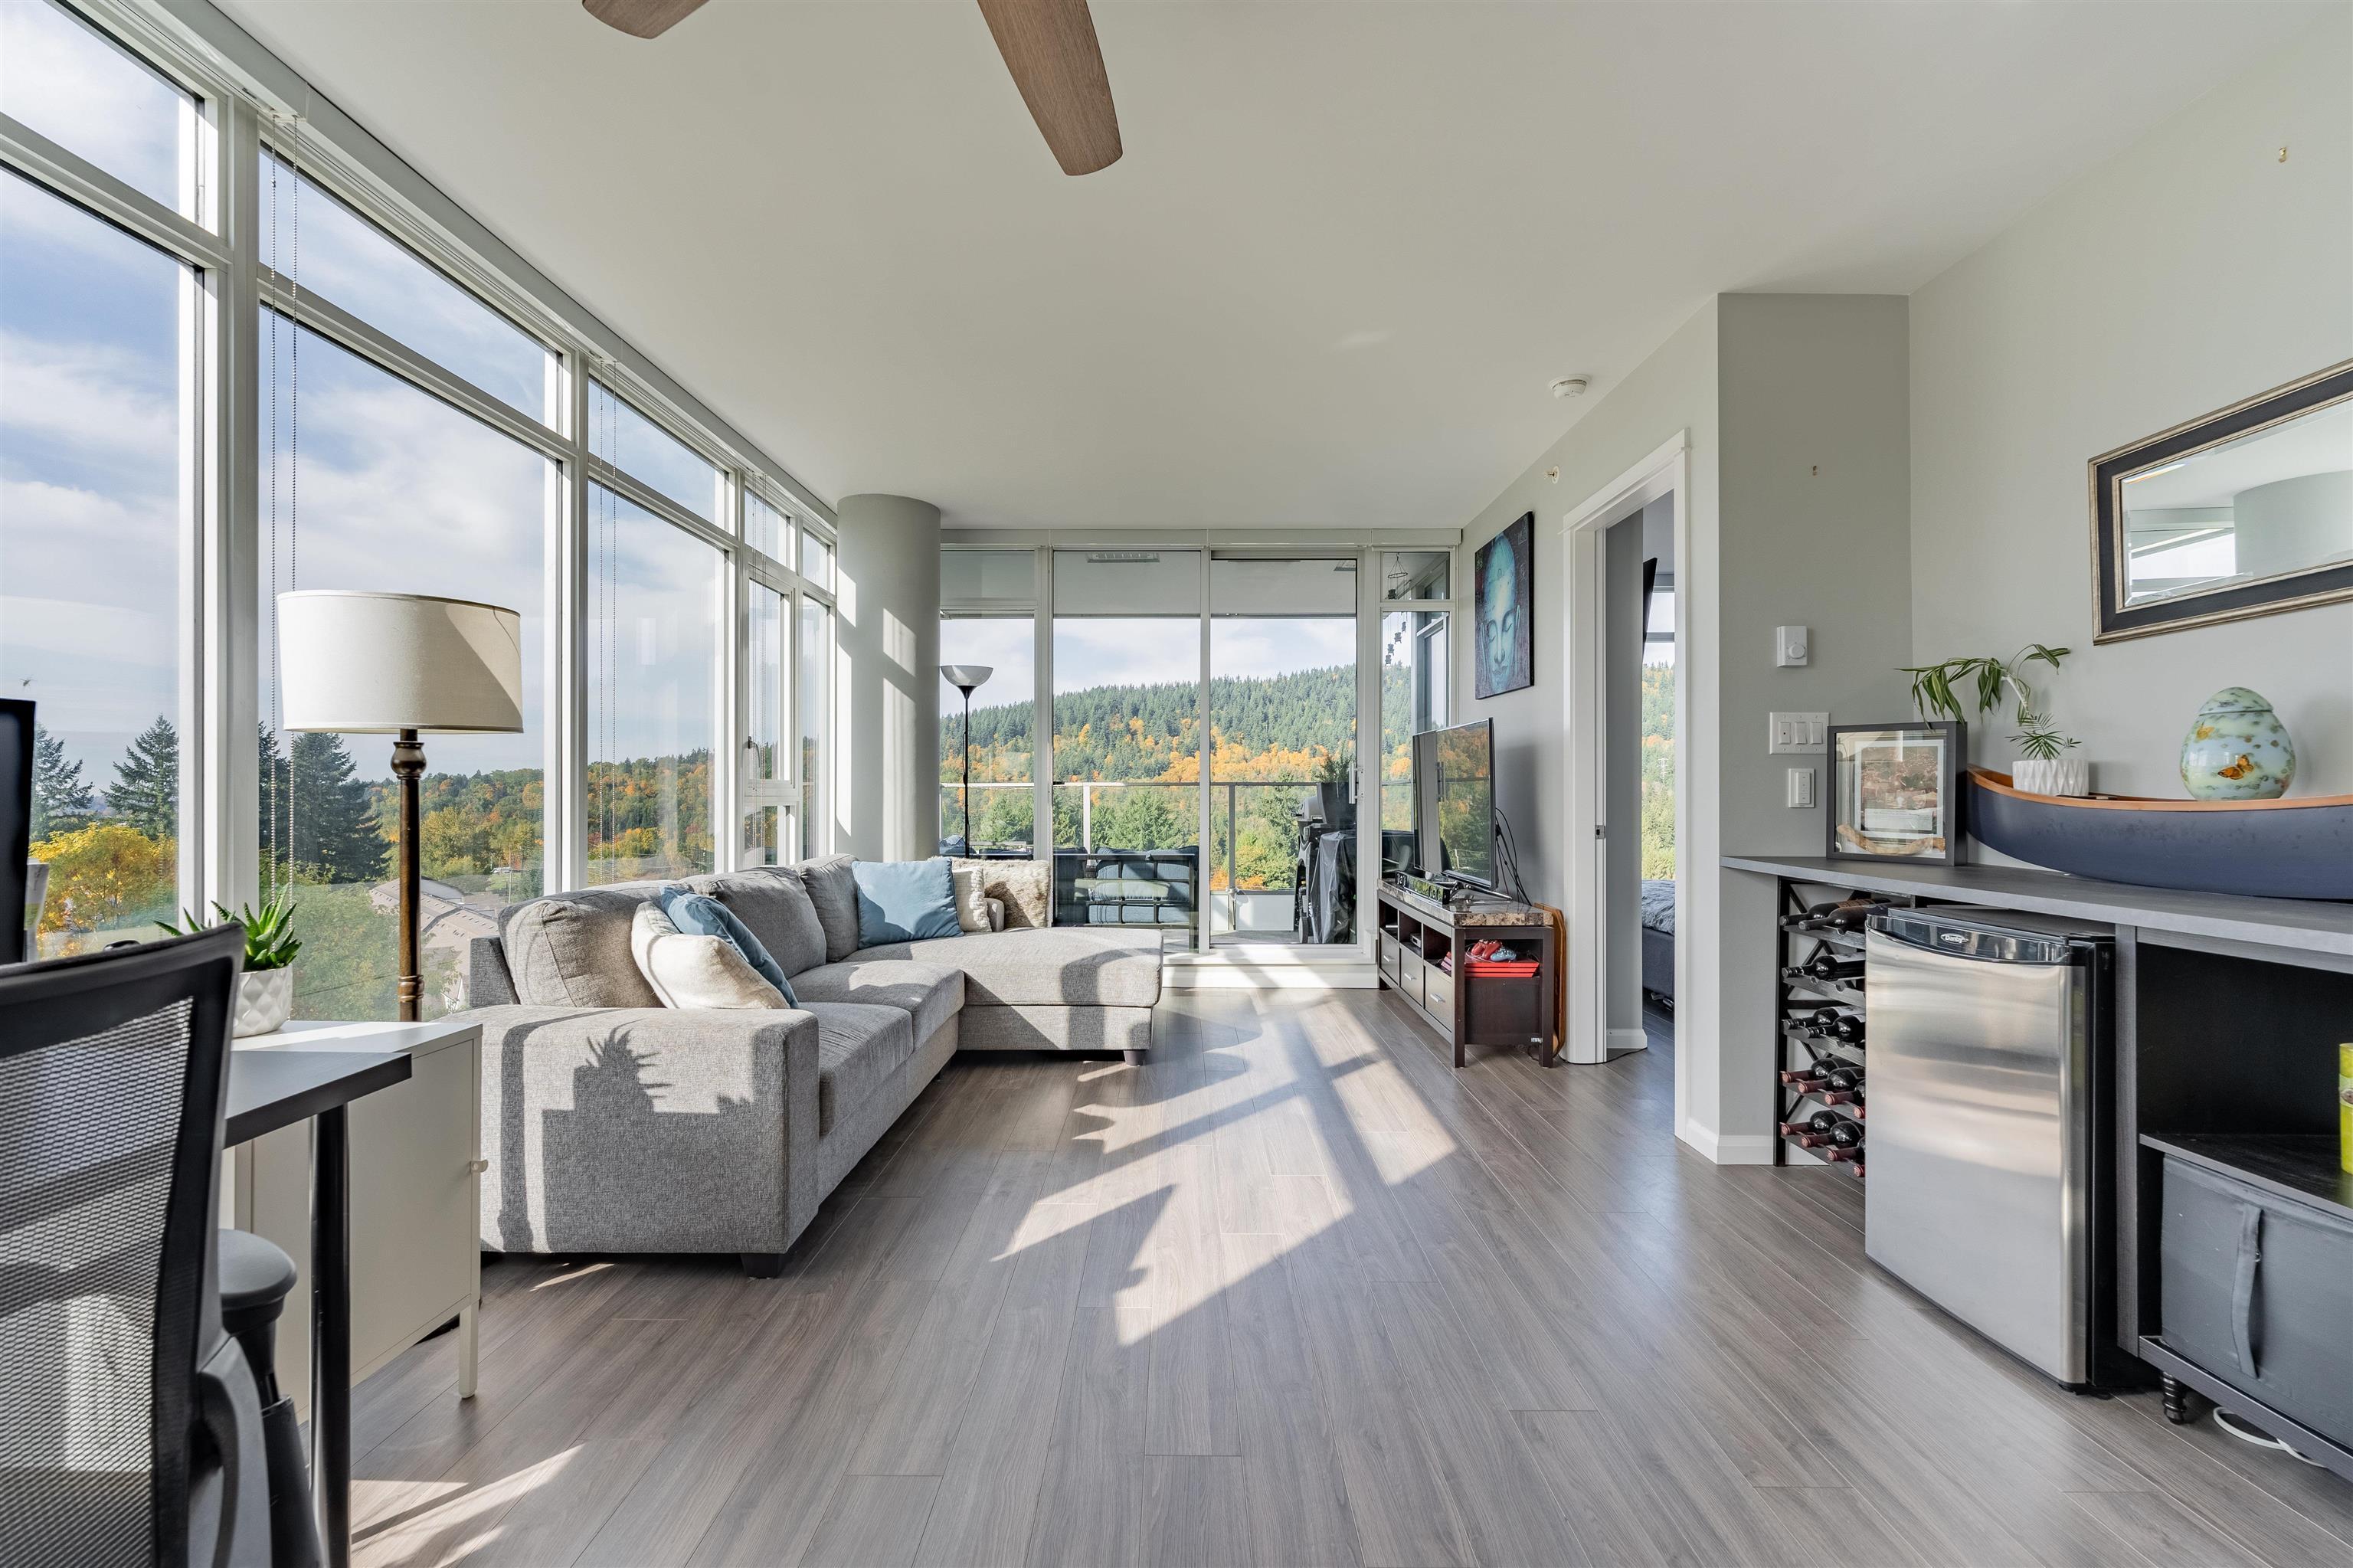 802 520 COMO LAKE AVENUE - Coquitlam West Apartment/Condo for sale, 2 Bedrooms (R2627575)